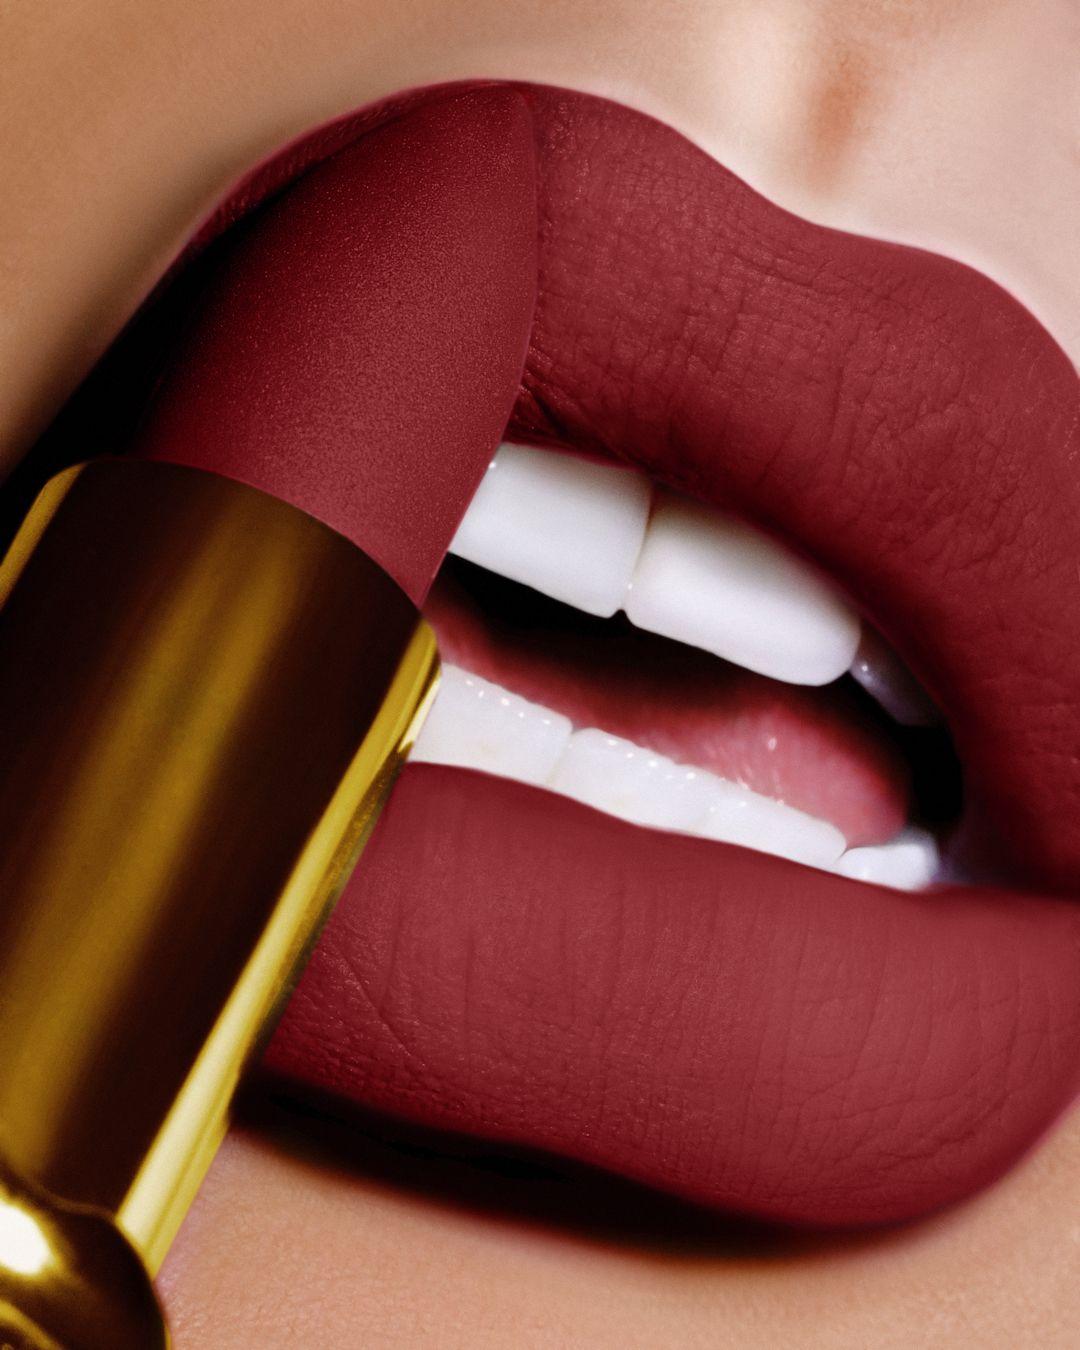 Mattetrance Lipstick Matte Lipstick Shades Burgundy Lipstick